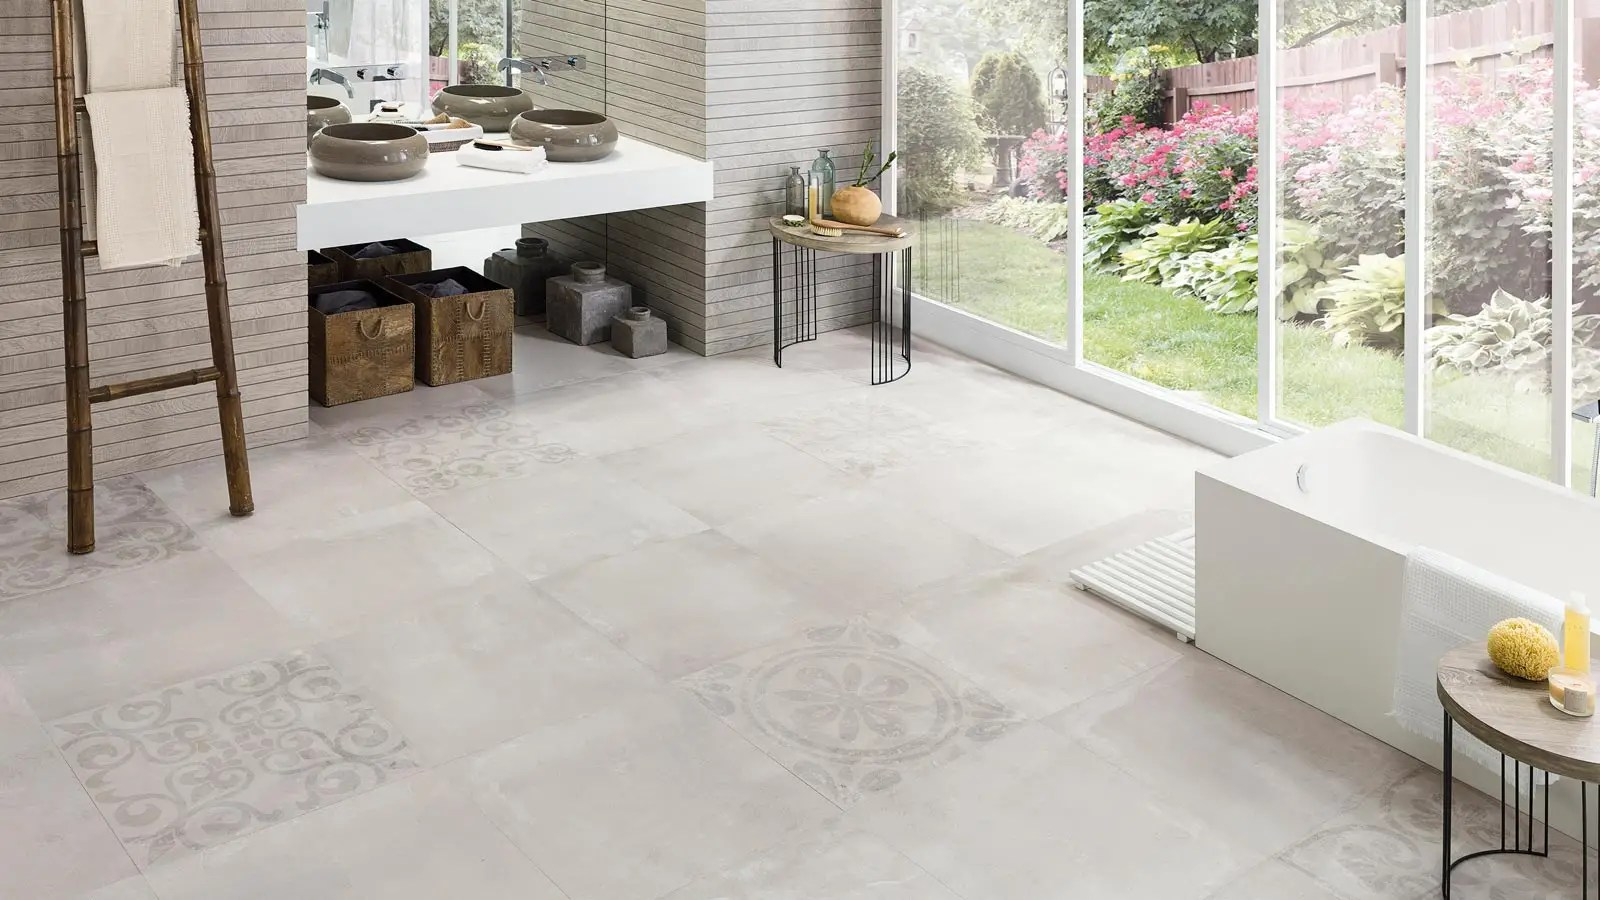 how to clean porcelain tiles 4 simple steps porcelanosa